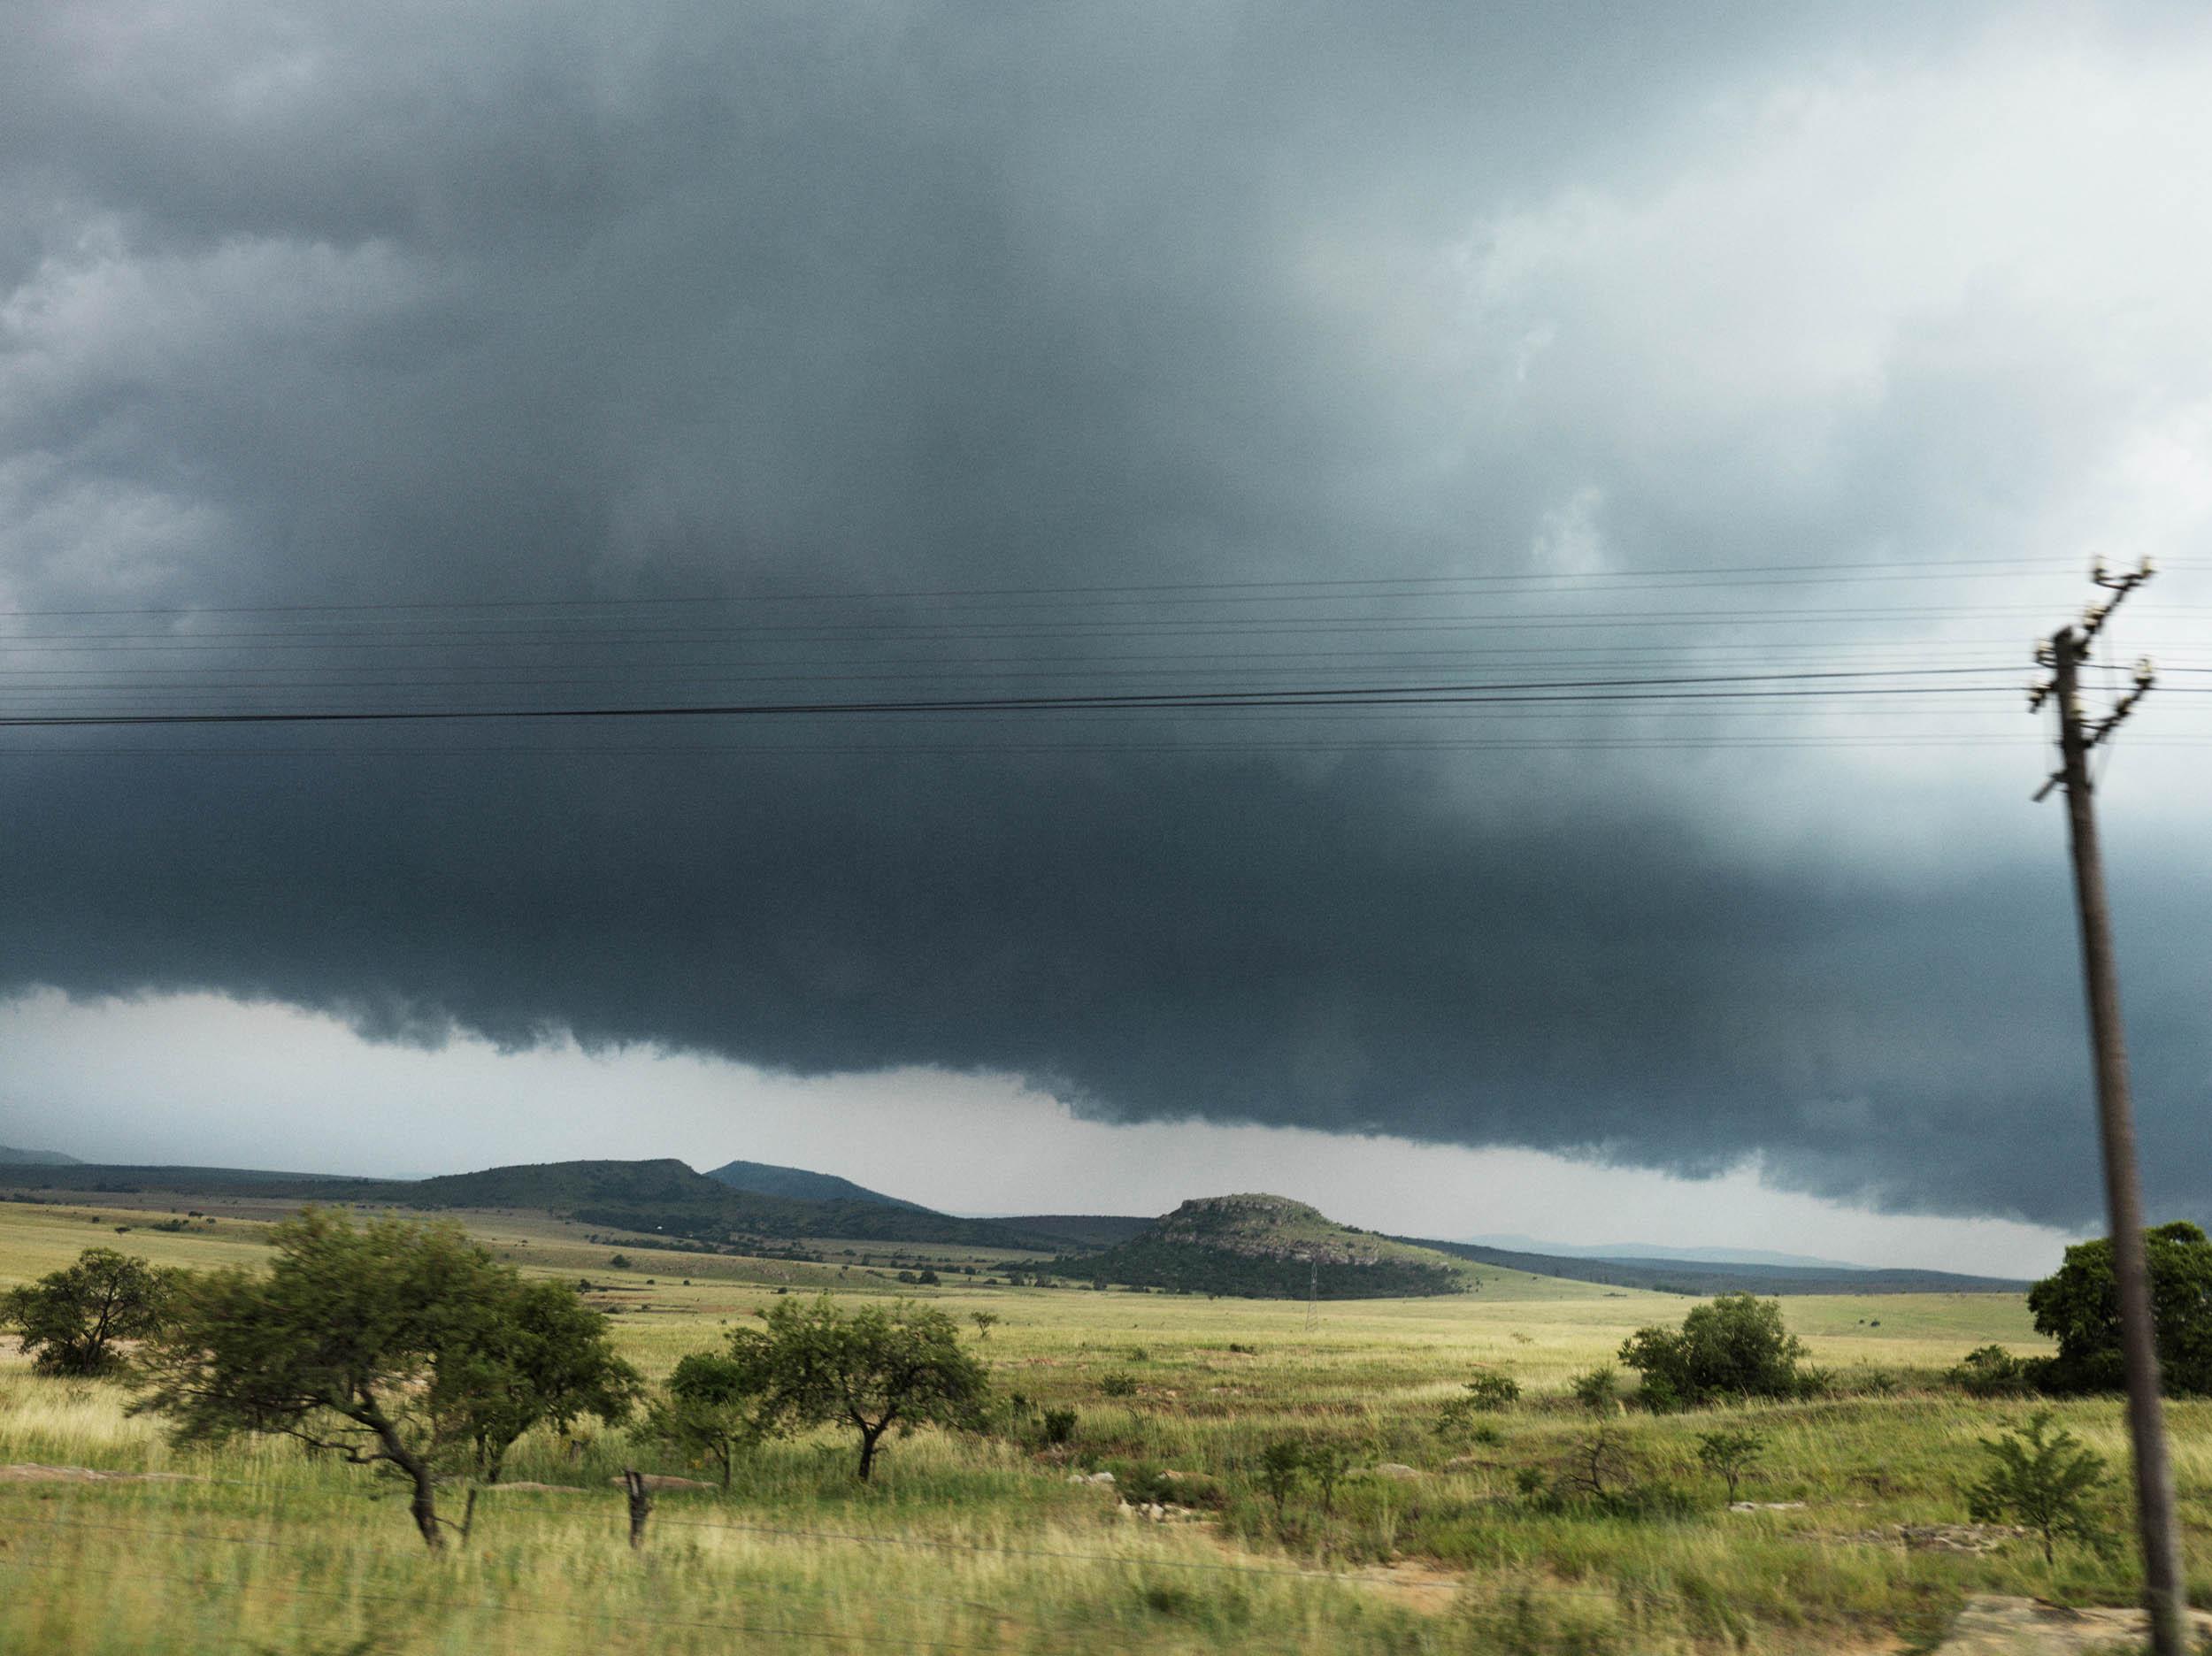 2015 03 23 - South Africa_0218.jpg